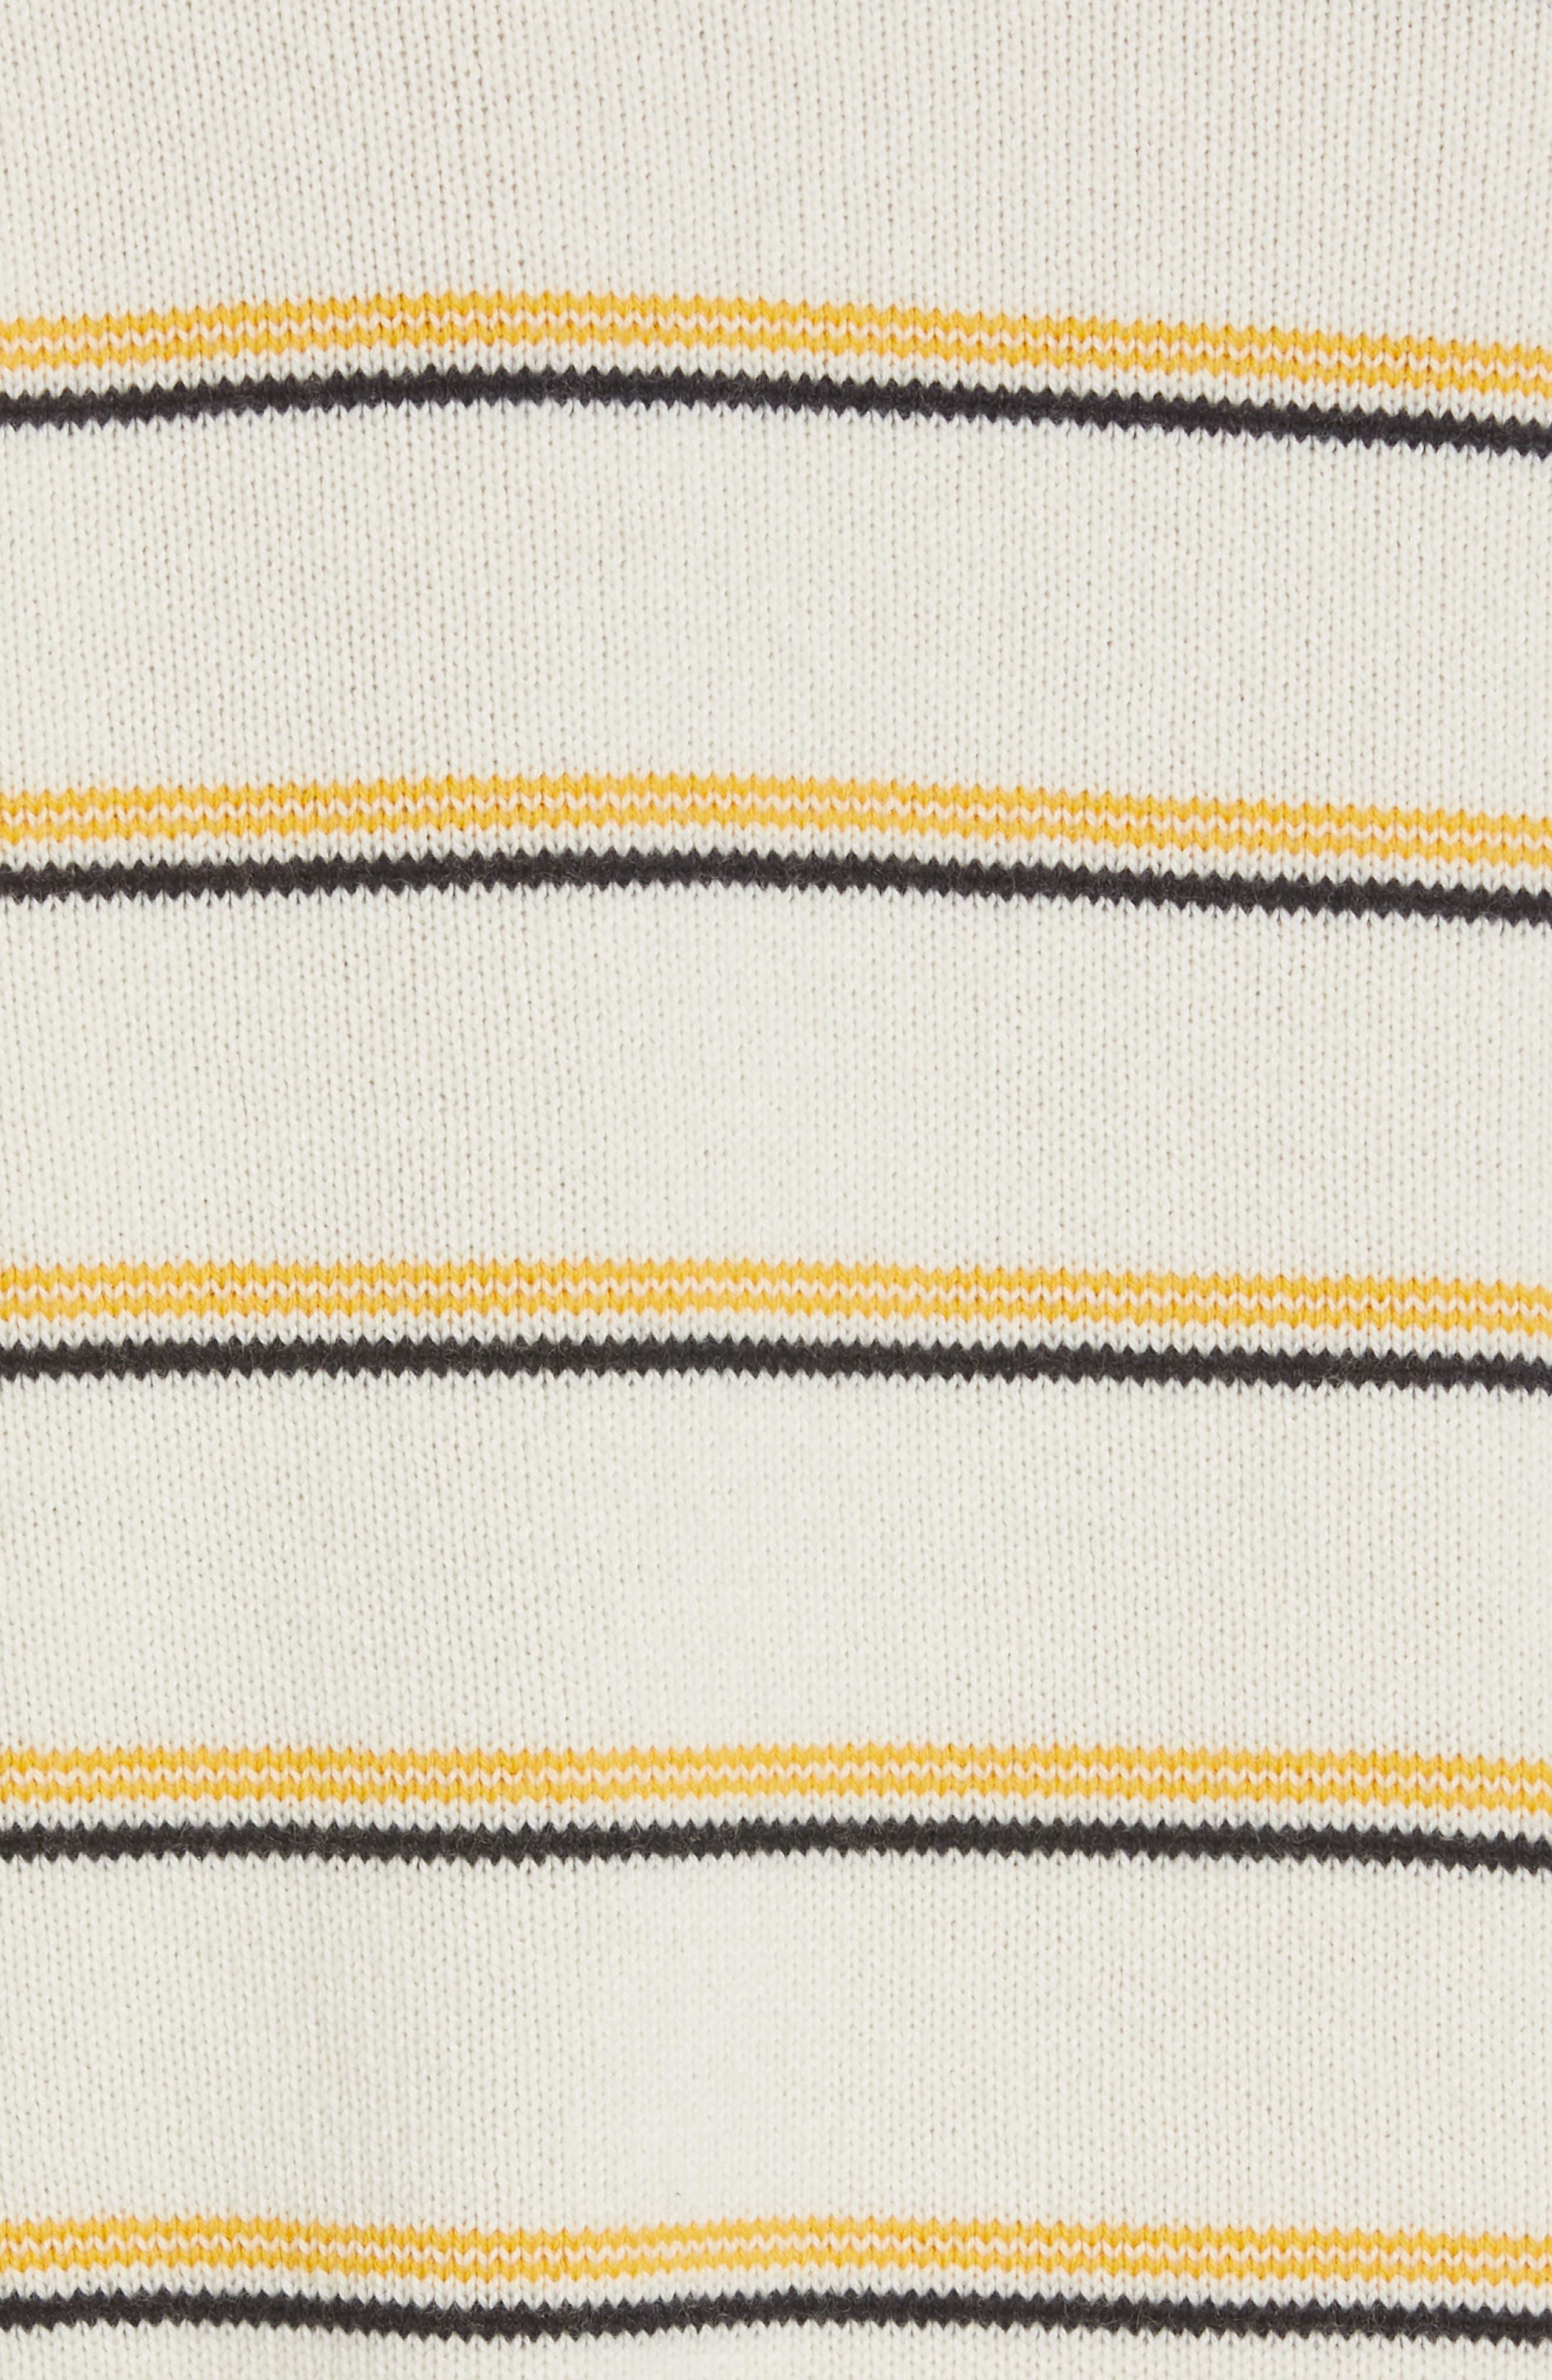 Duru Wool & Cashmere Sweater,                             Alternate thumbnail 5, color,                             NATURE WHITE MULTI